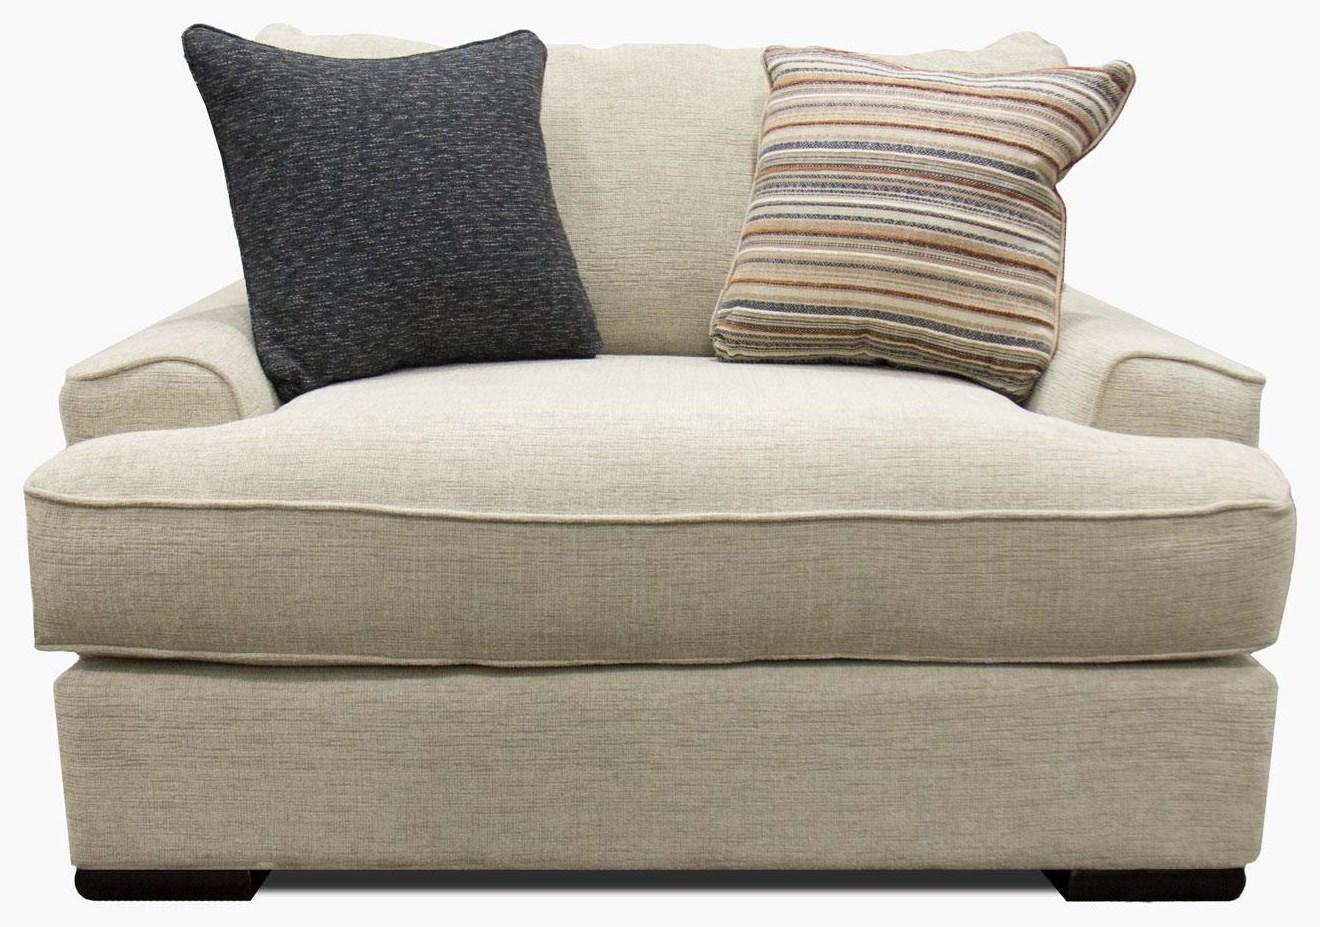 Fusion Furniture Bradley-Cream Chair & A Half - Item Number: 2012-BRADLEY-CREAM